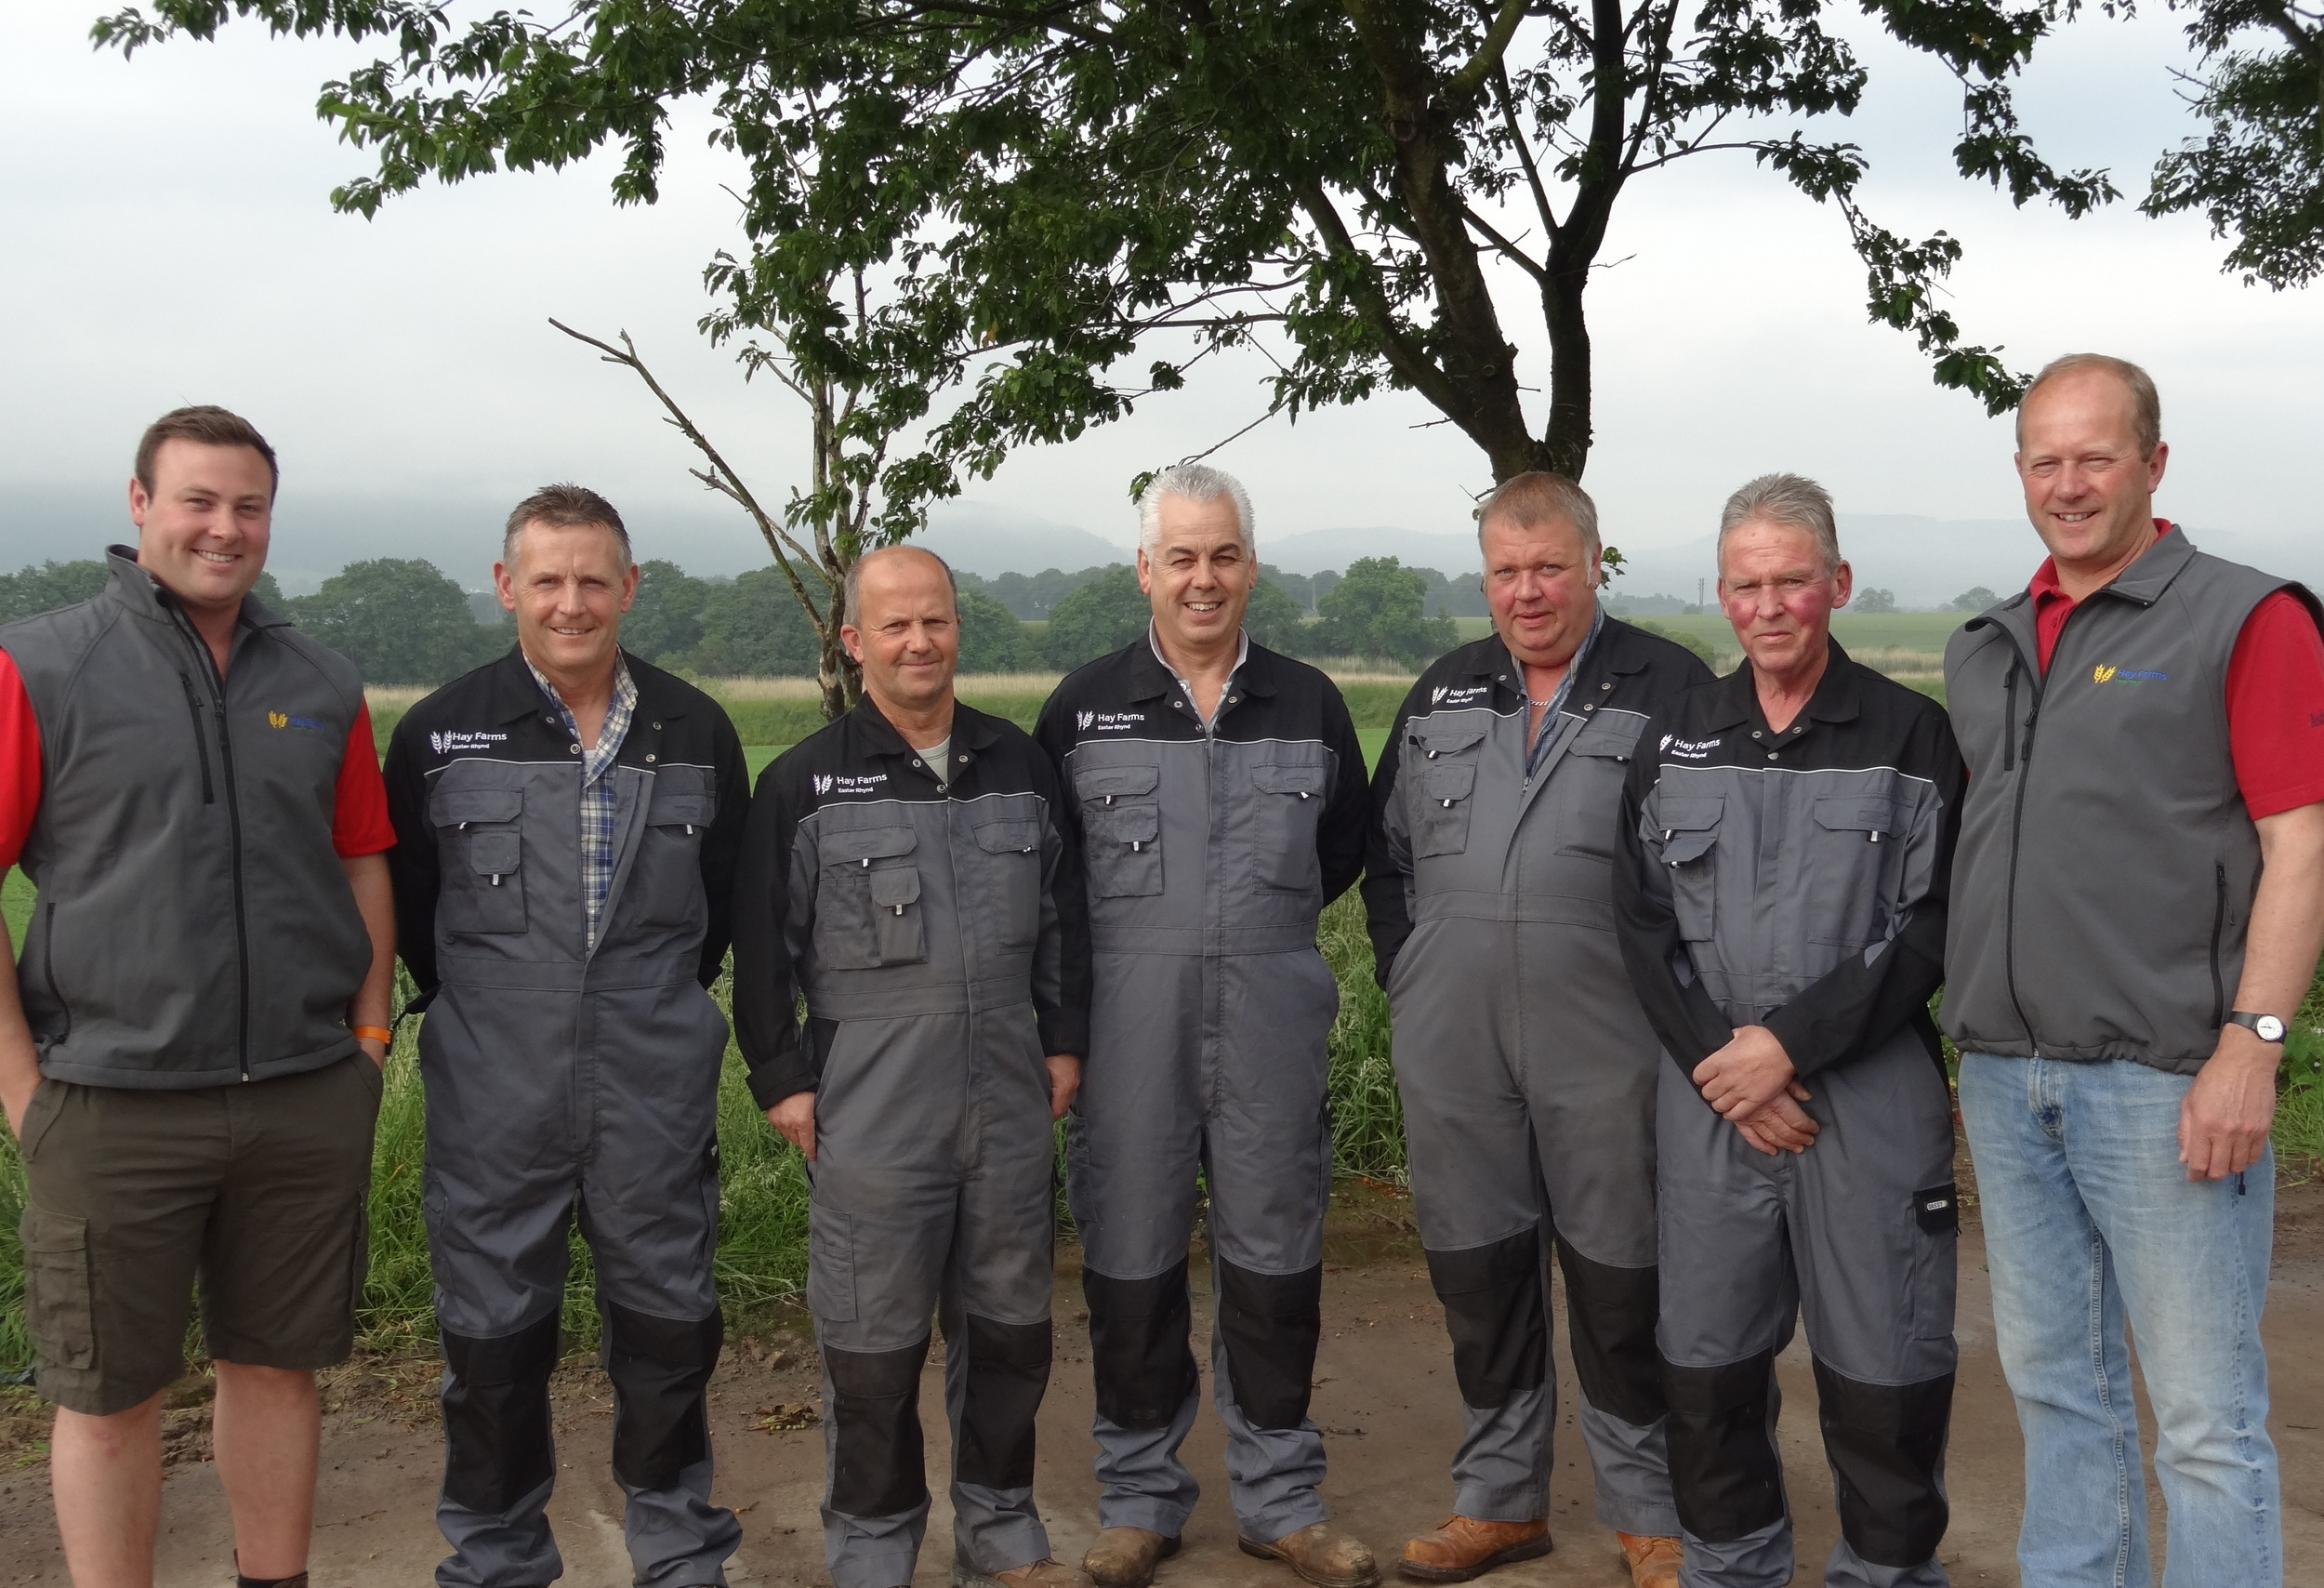 L-R Finlay Hay, Dave McDonald, Alex Morrison, Willie Baillie, Alan Simpson, Graeme Leslie, David Hay